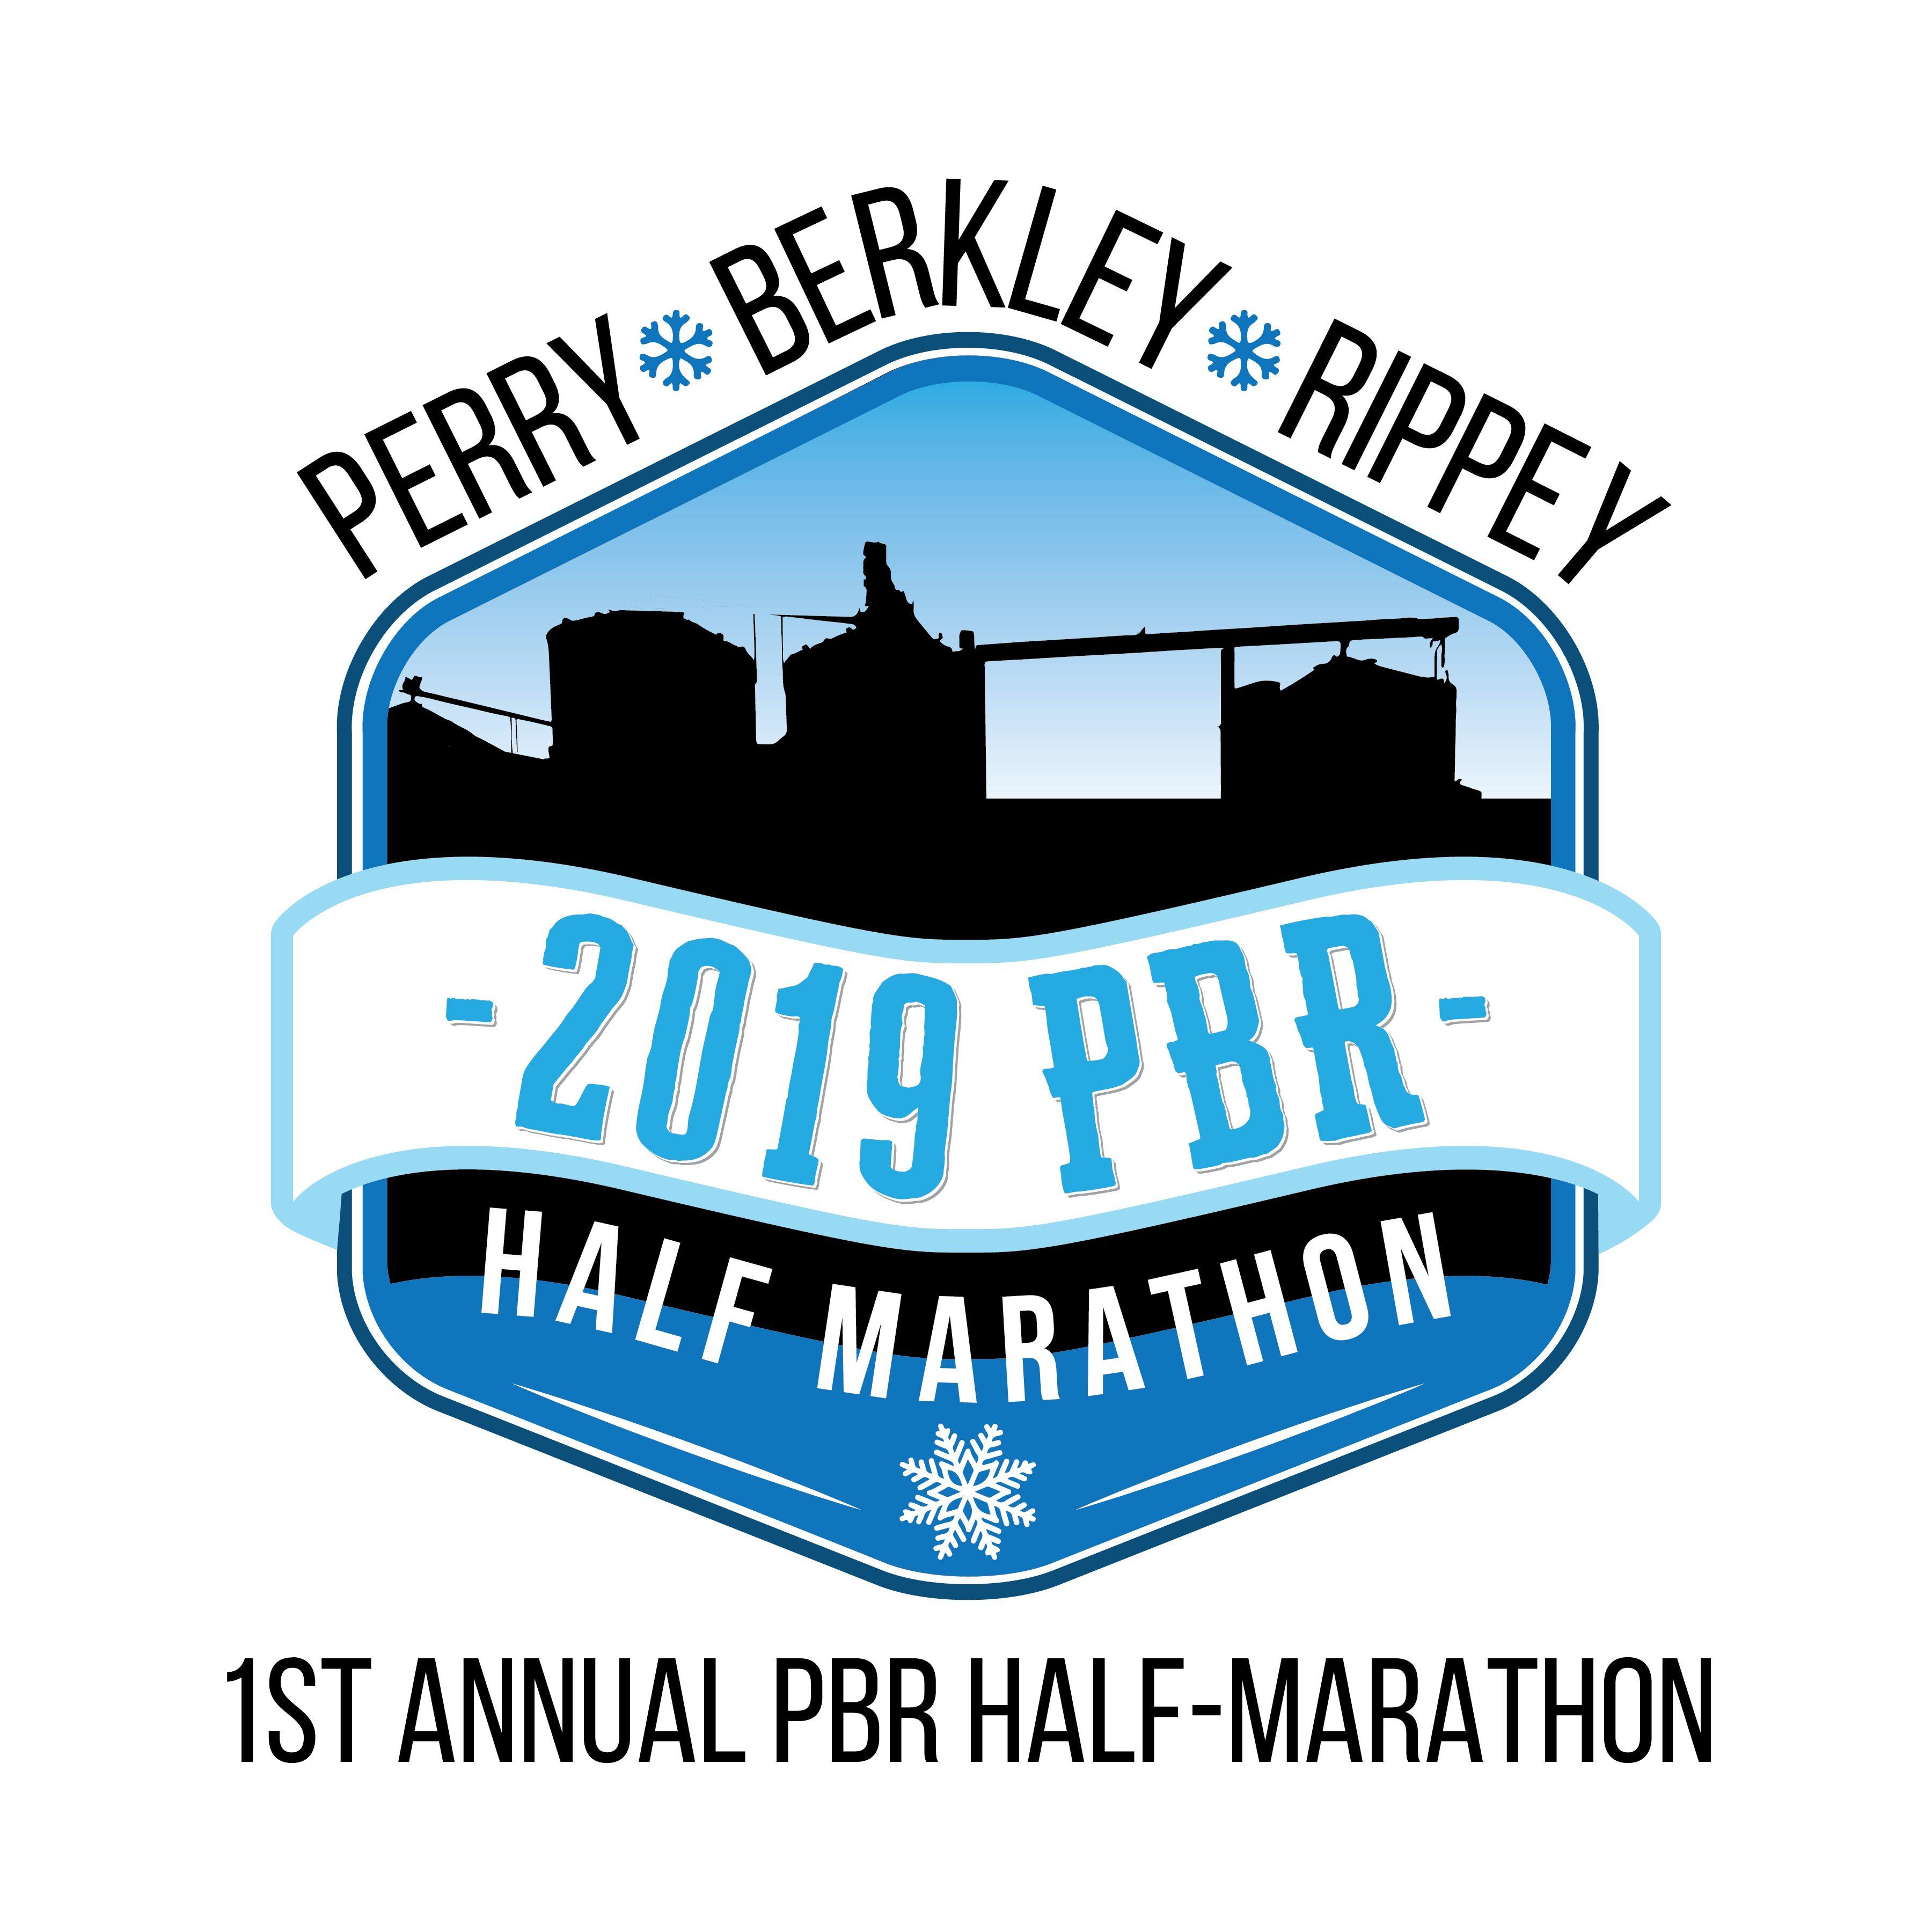 The PBR Half Marathon